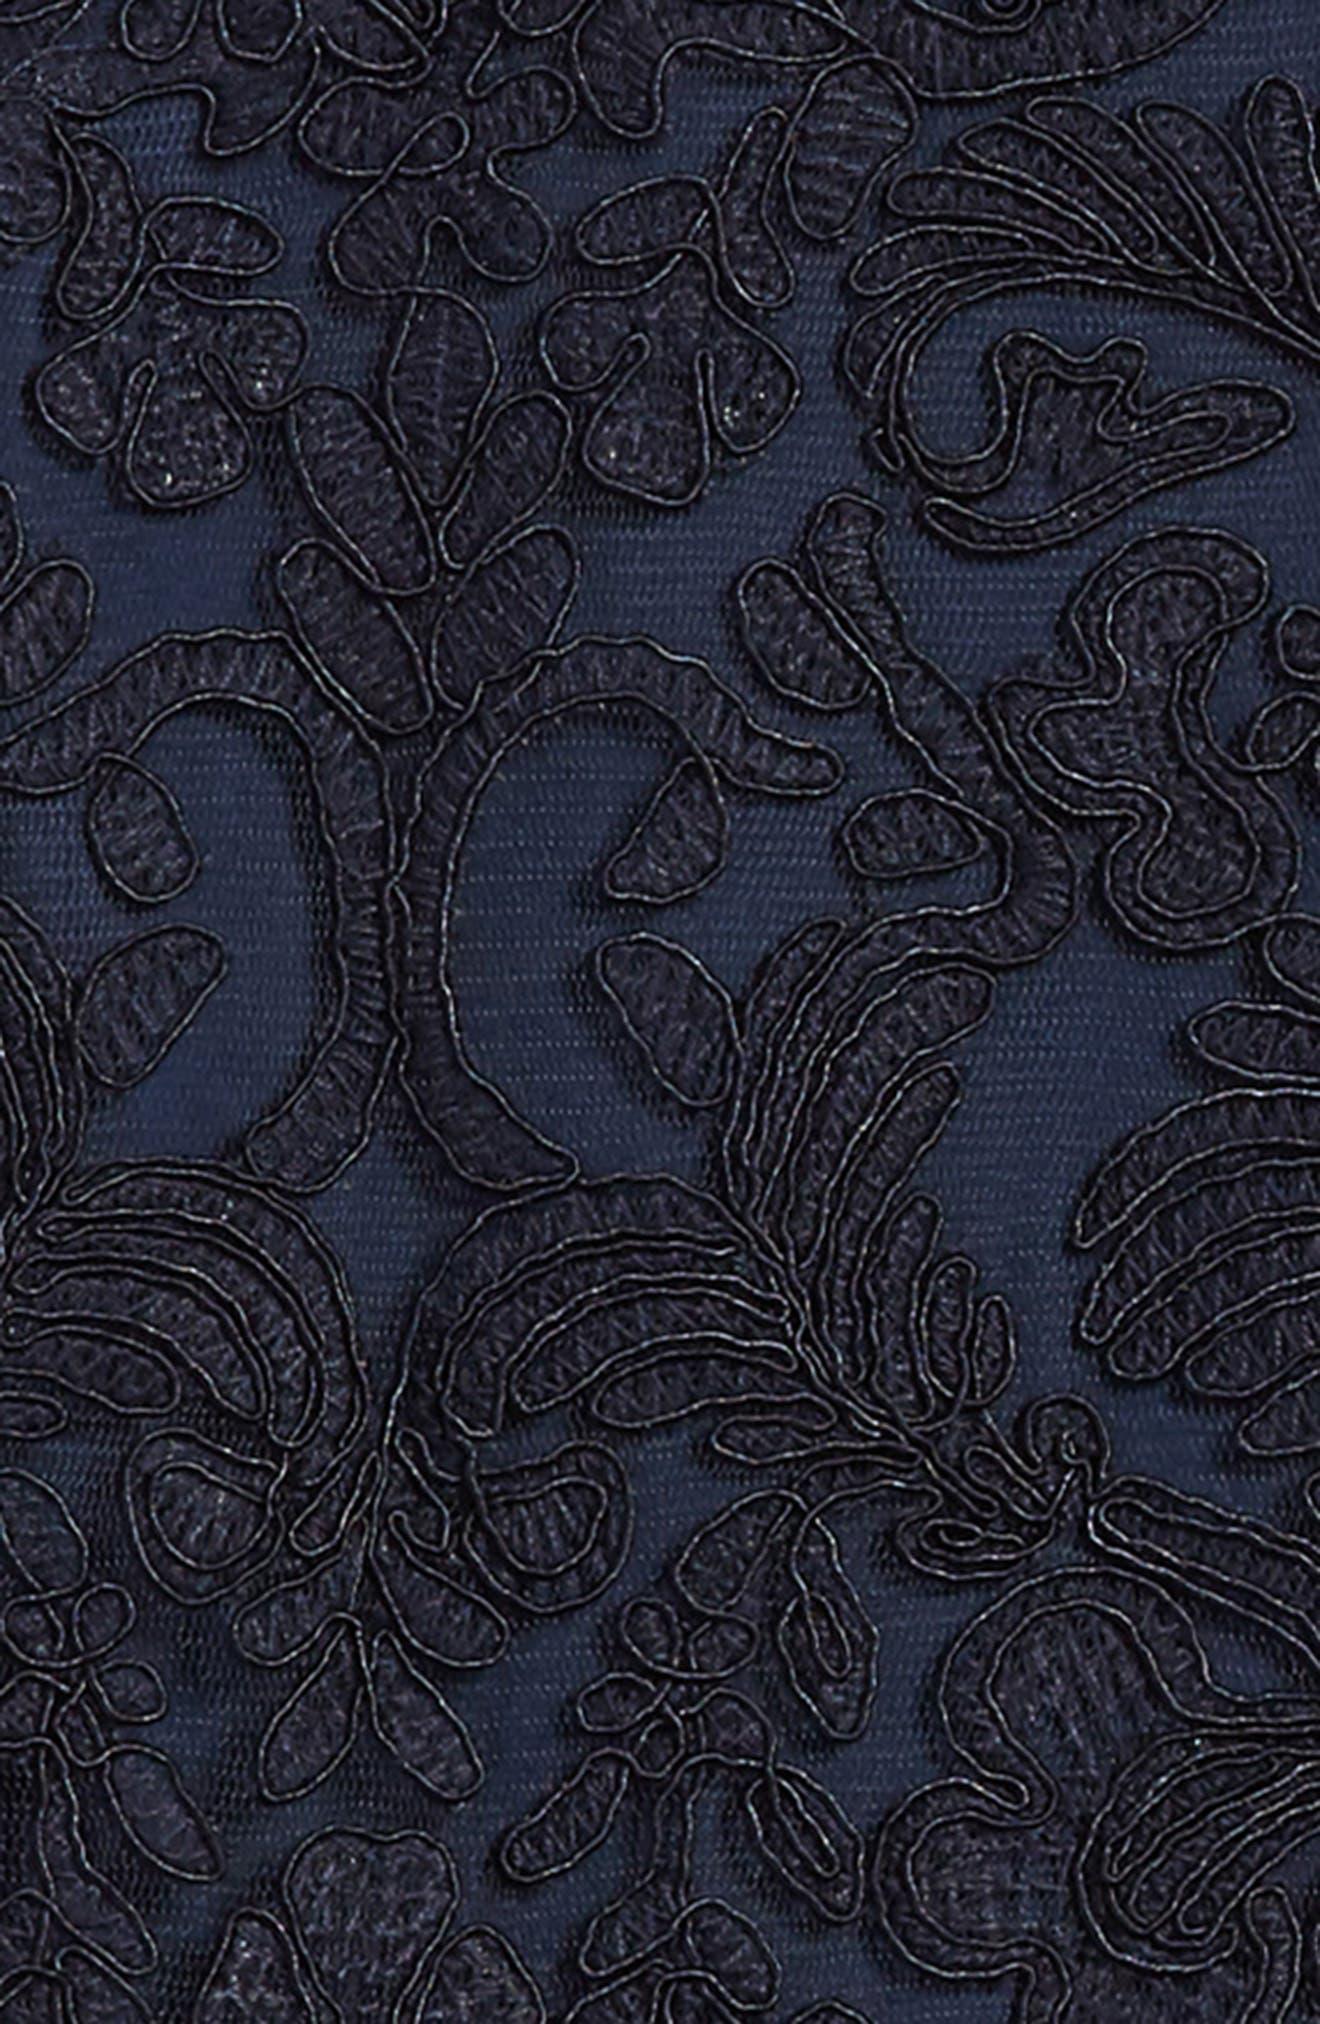 'Honeysuckle' Embroidered Tulle Dress,                             Alternate thumbnail 3, color,                             415